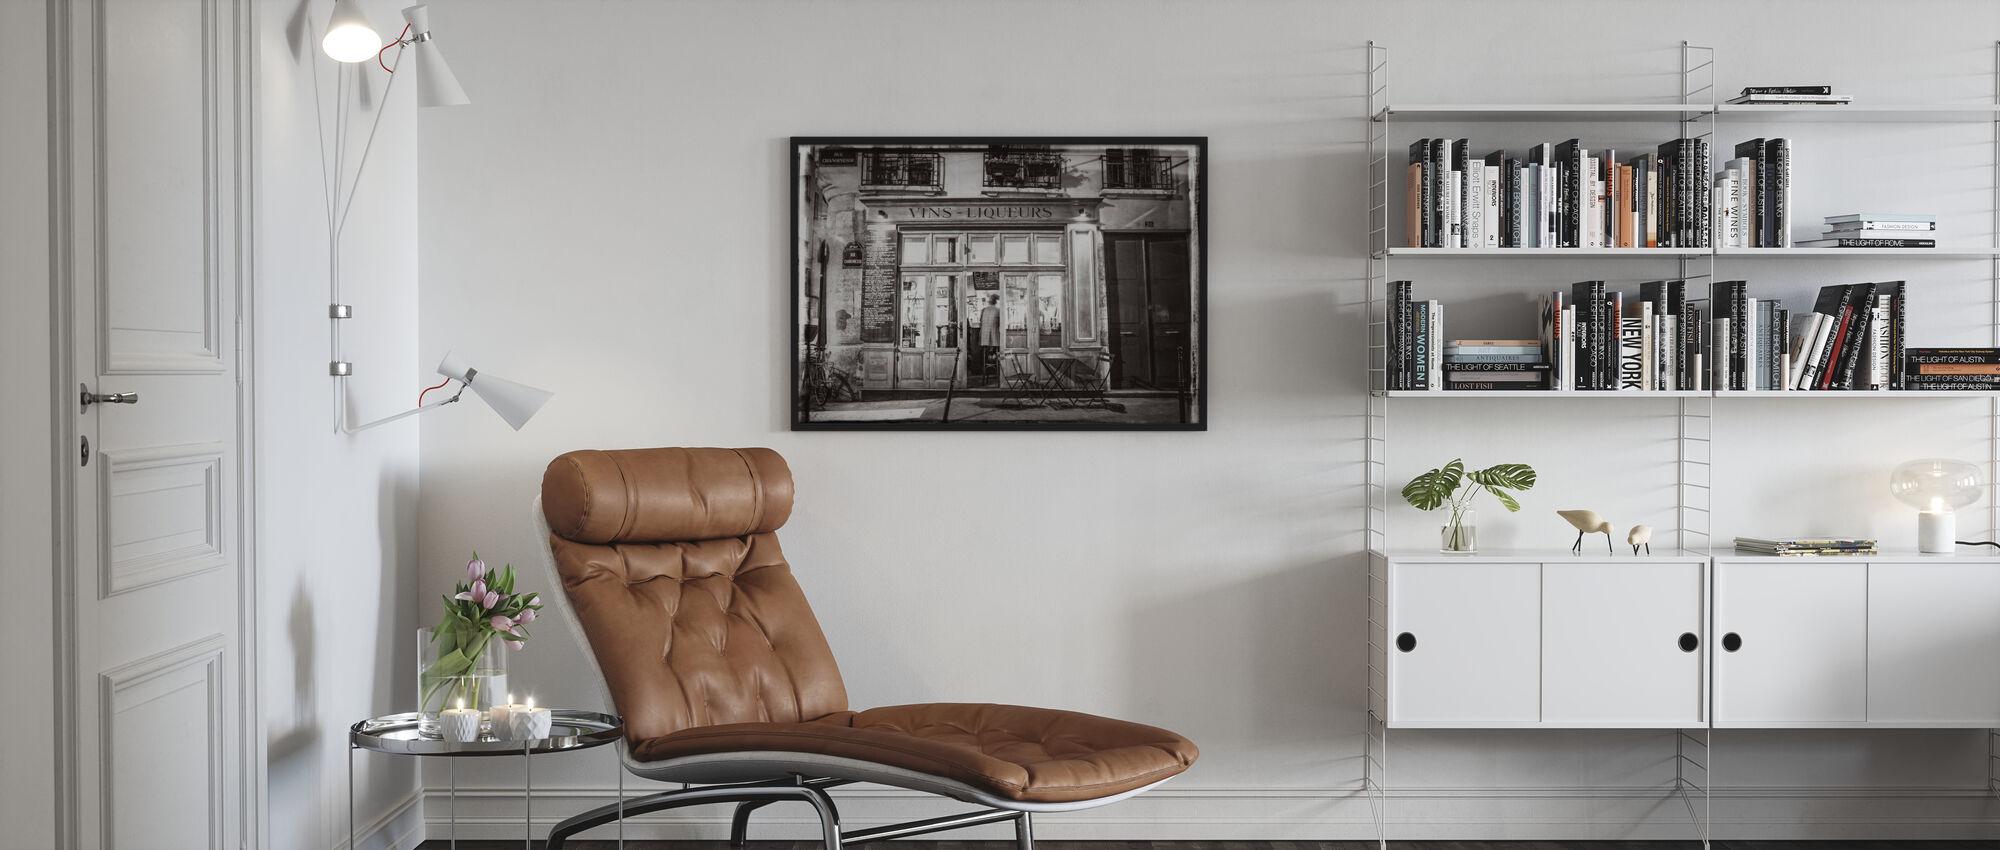 Liquor Store - Paris - Poster - Living Room